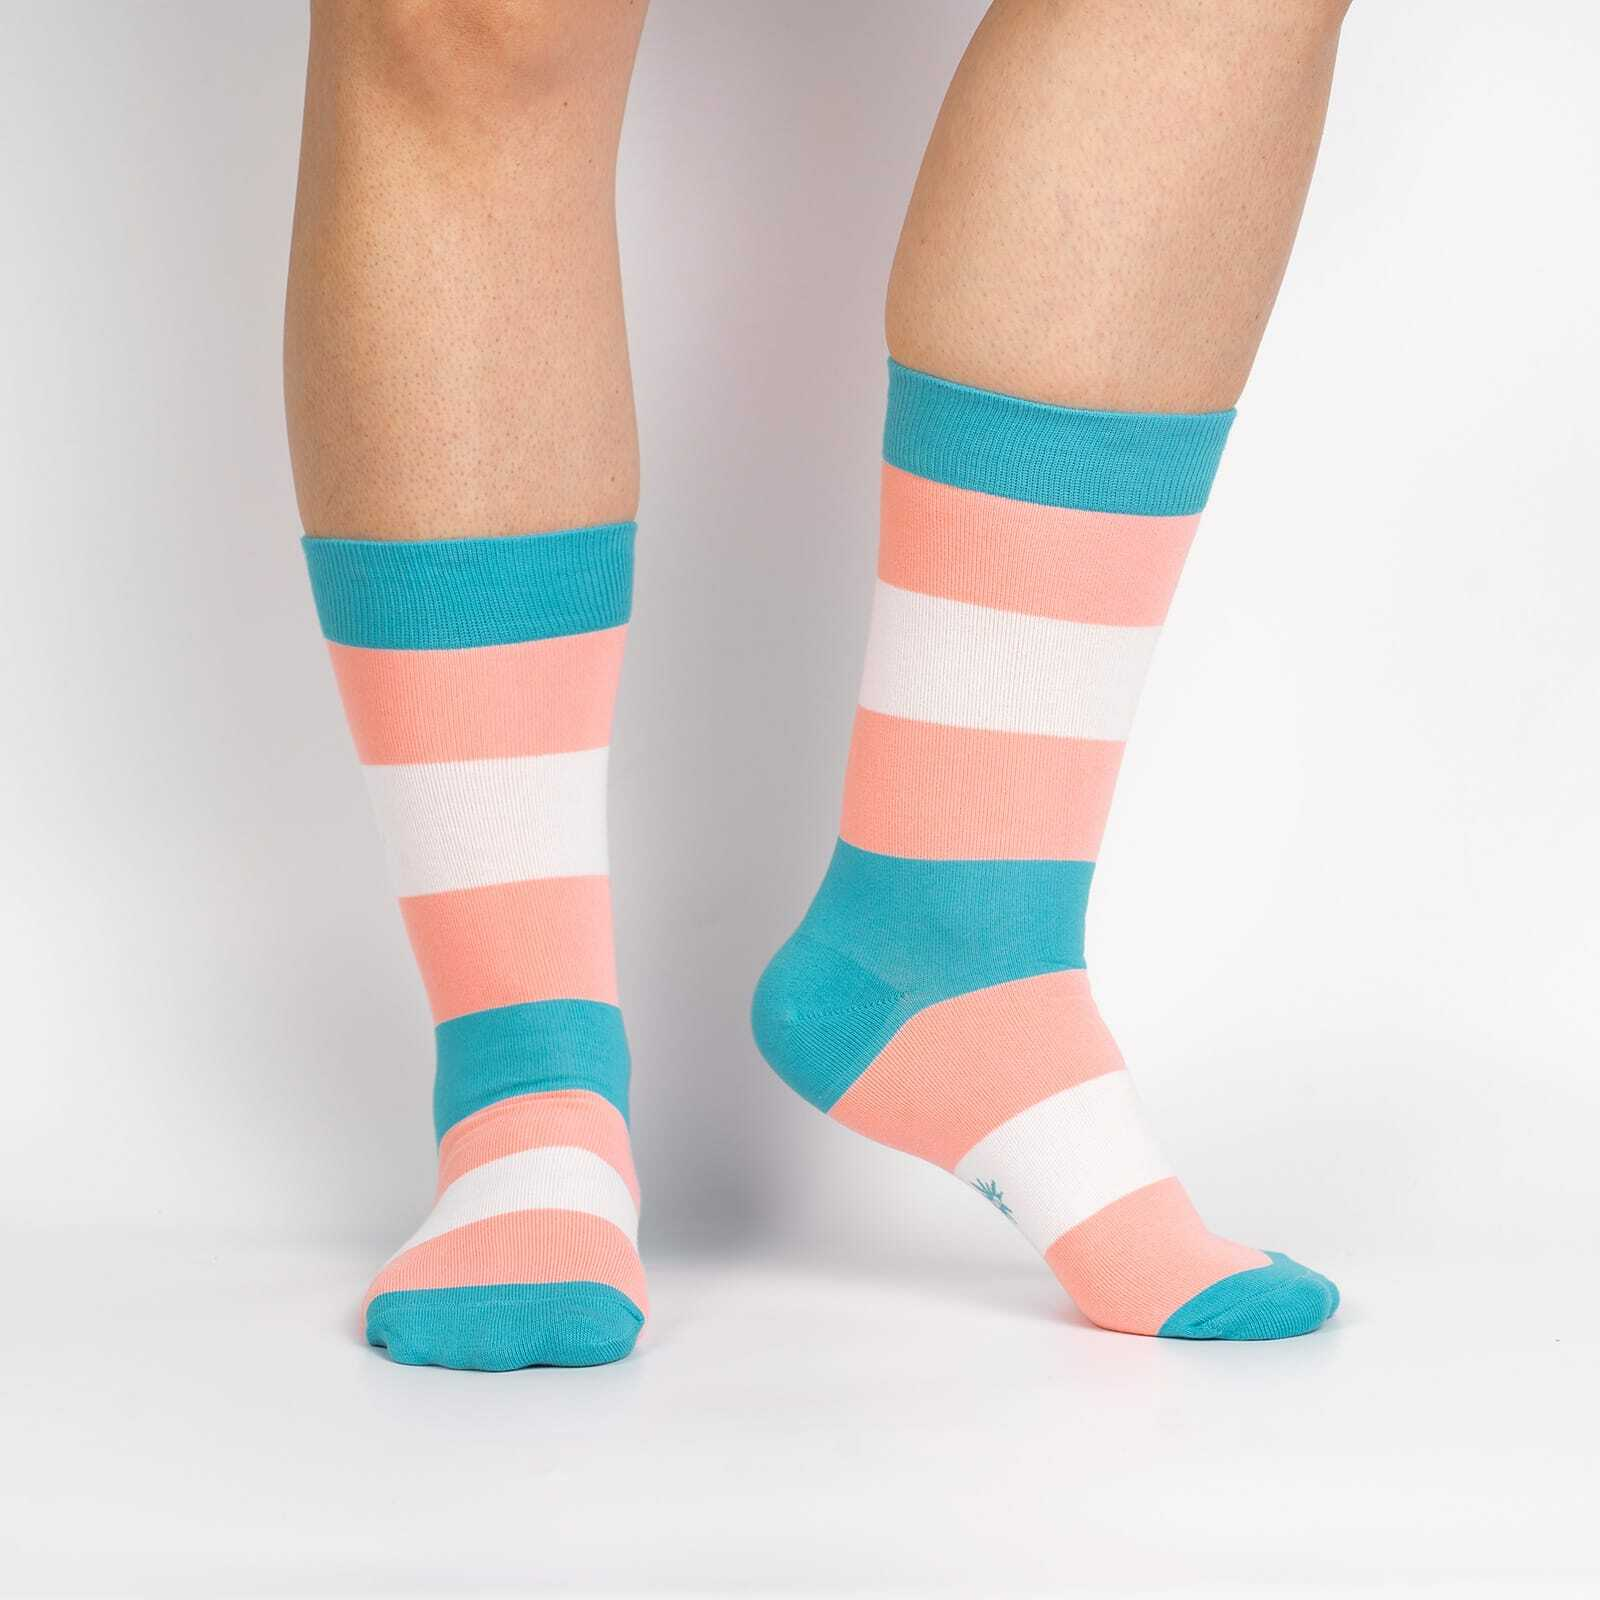 model wearing Trans Pride Unisex Crew Socks - S/M